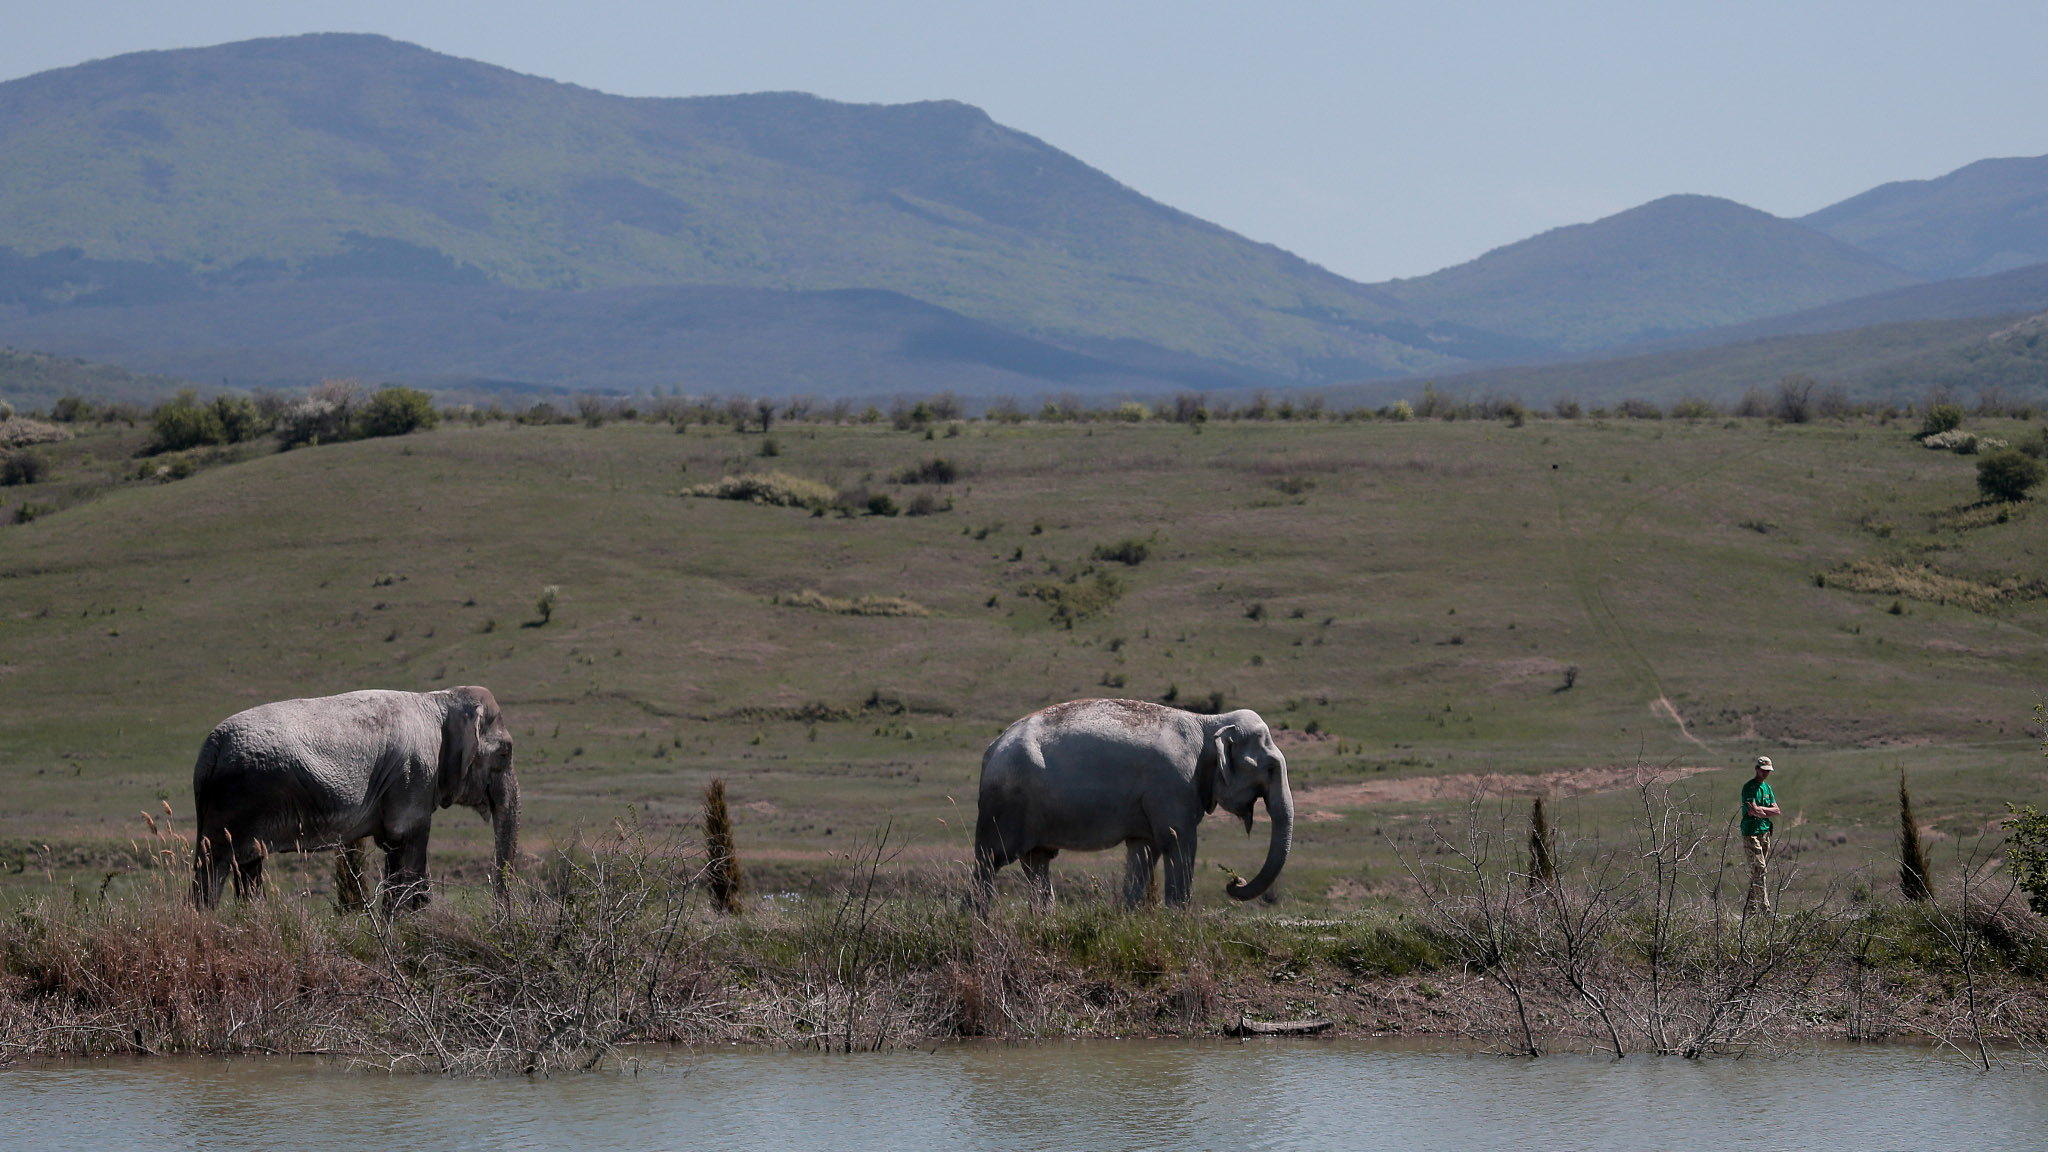 Crimean safari park opens enclosure for retired circus elephants